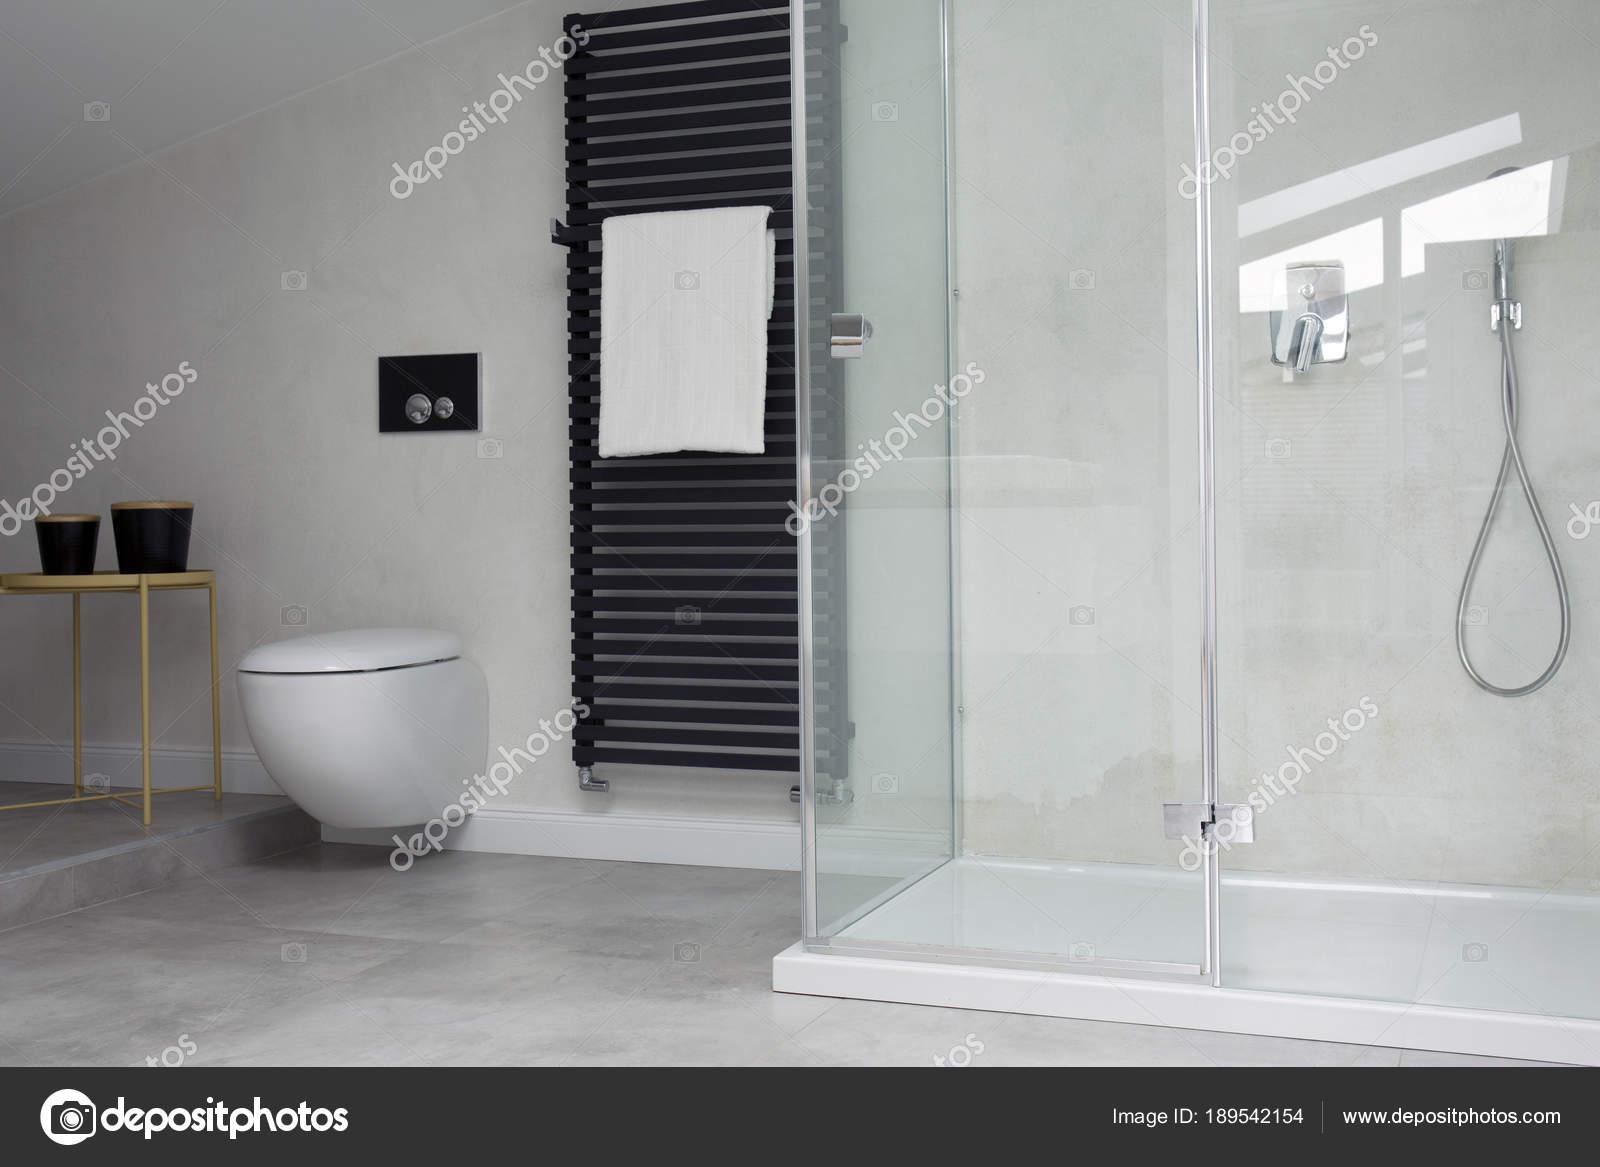 Glas Dusche In Helles Badezimmer Stockfoto C Photographee Eu